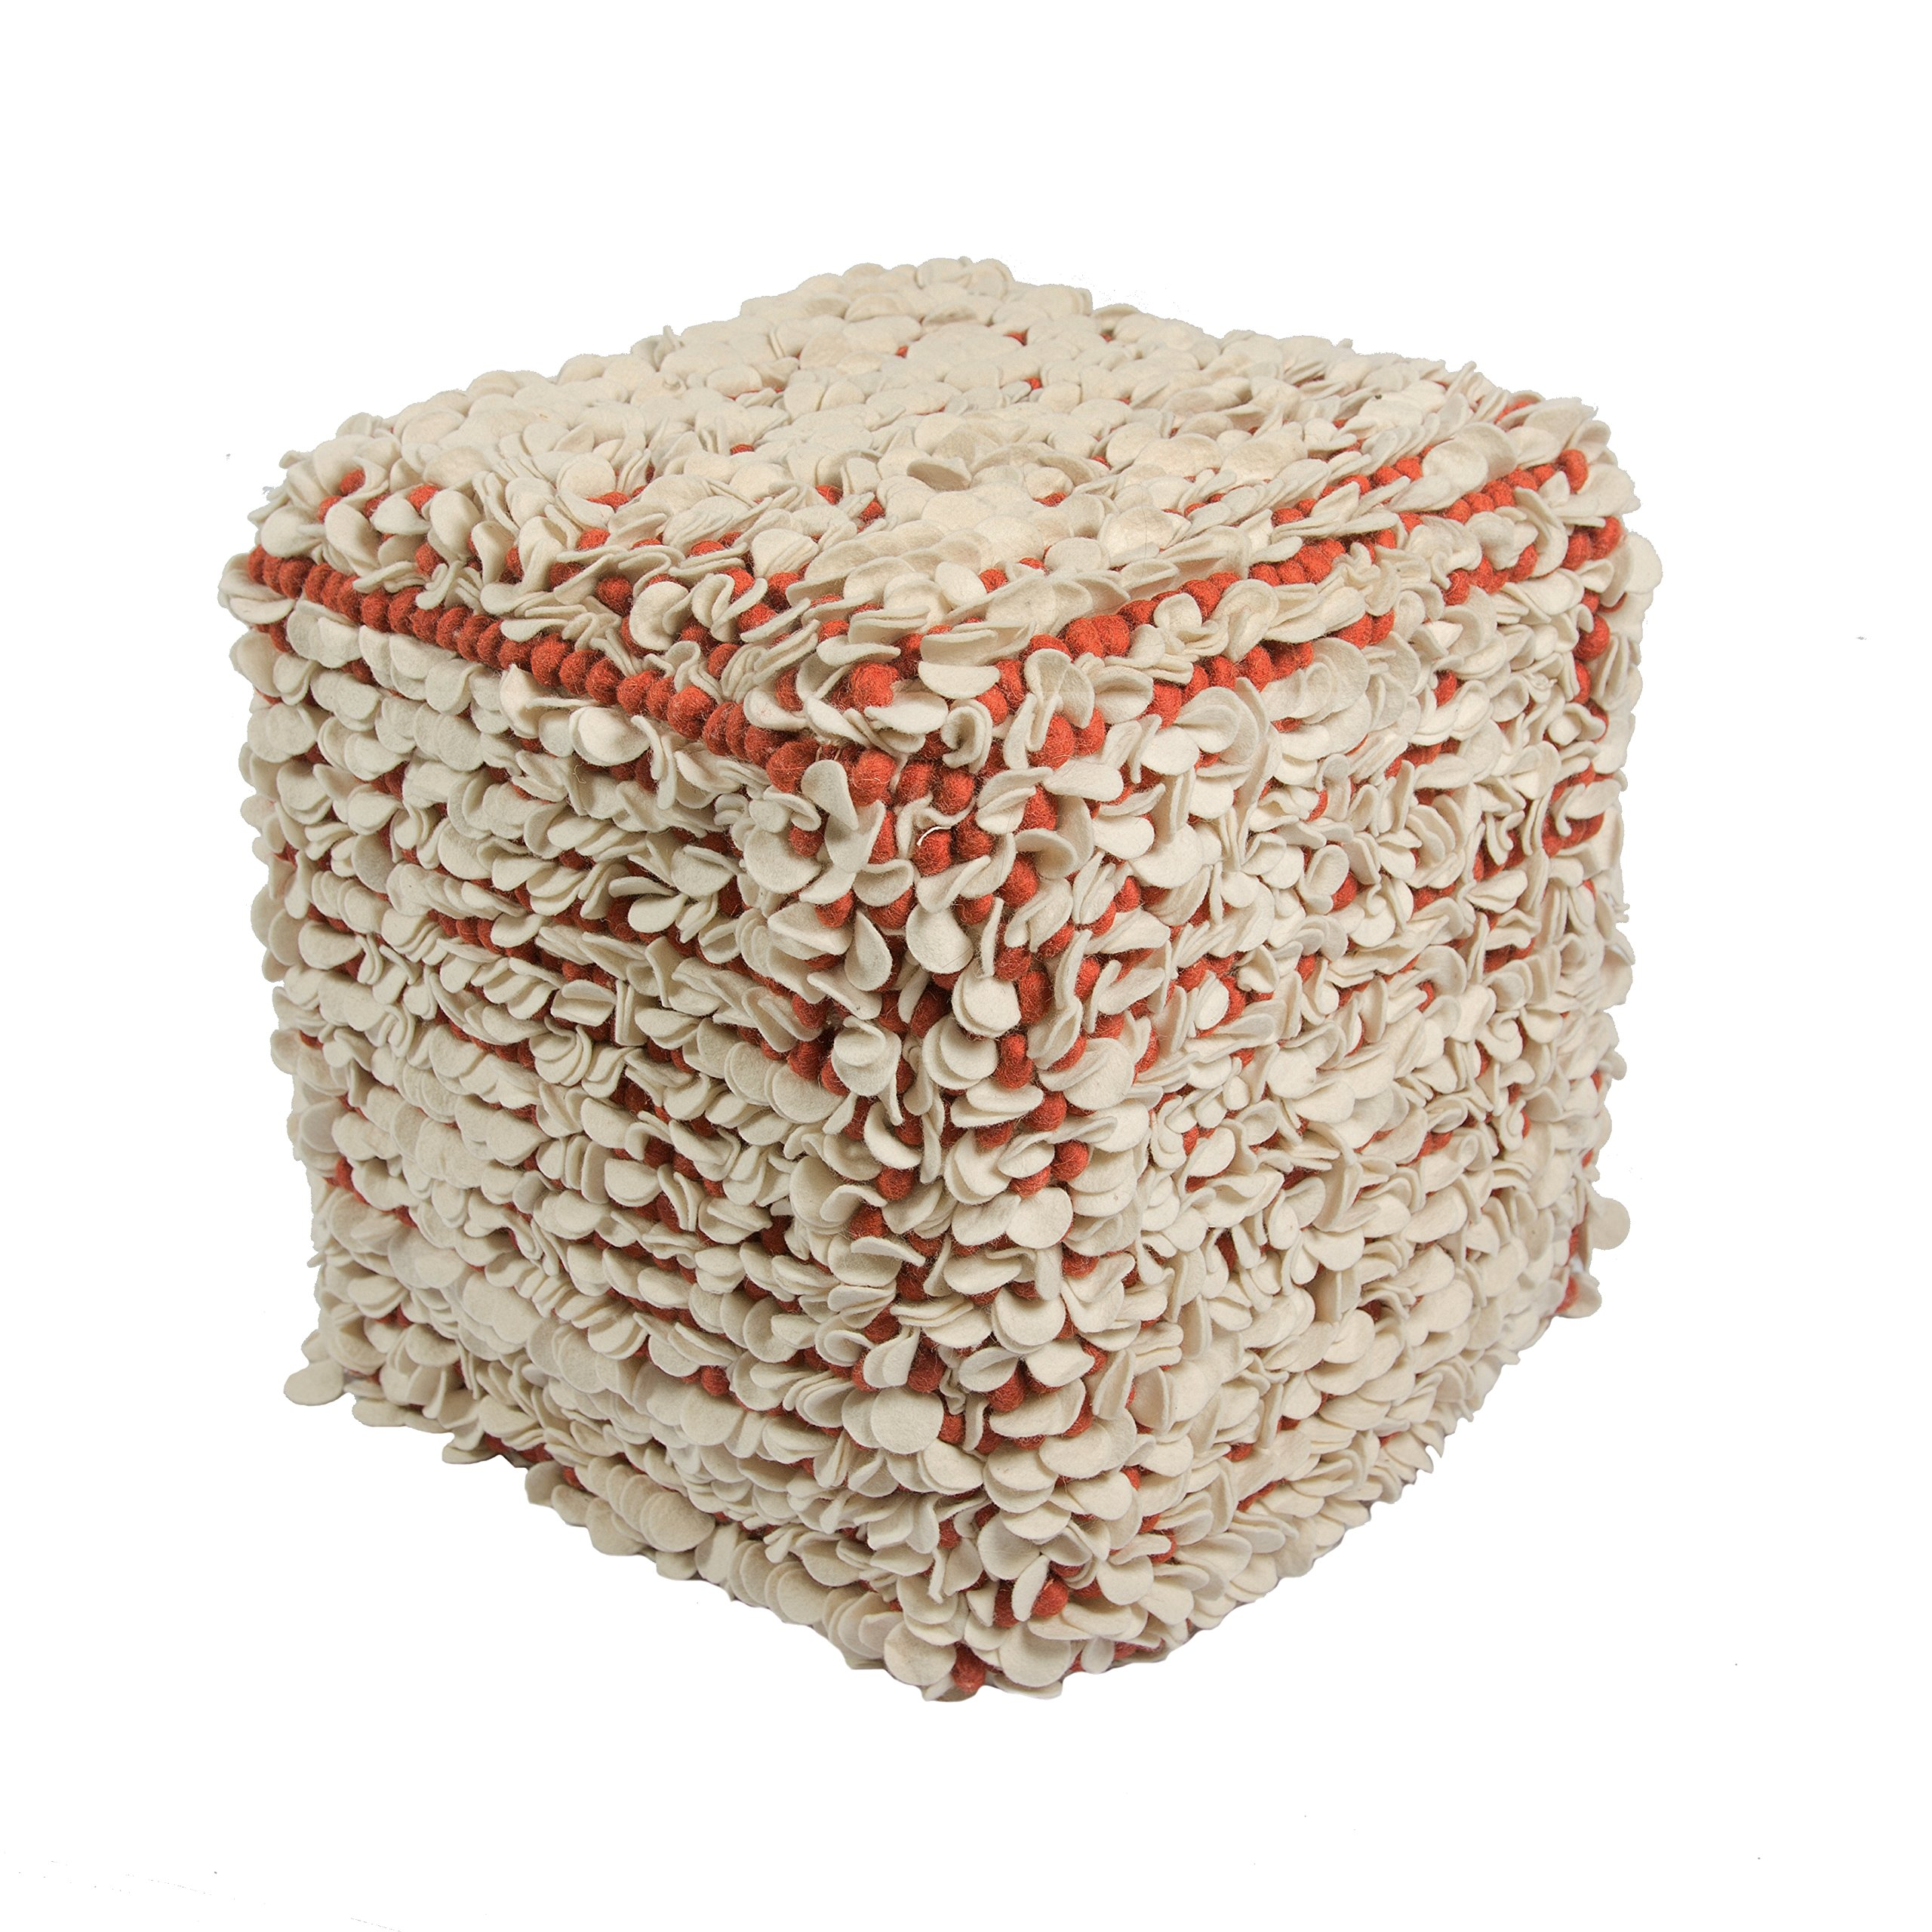 Jaipur Textural Pattern Ivory/Red Wool Pouf, 16-Inch x 18-Inch x 18-Inch, Egret Tasha